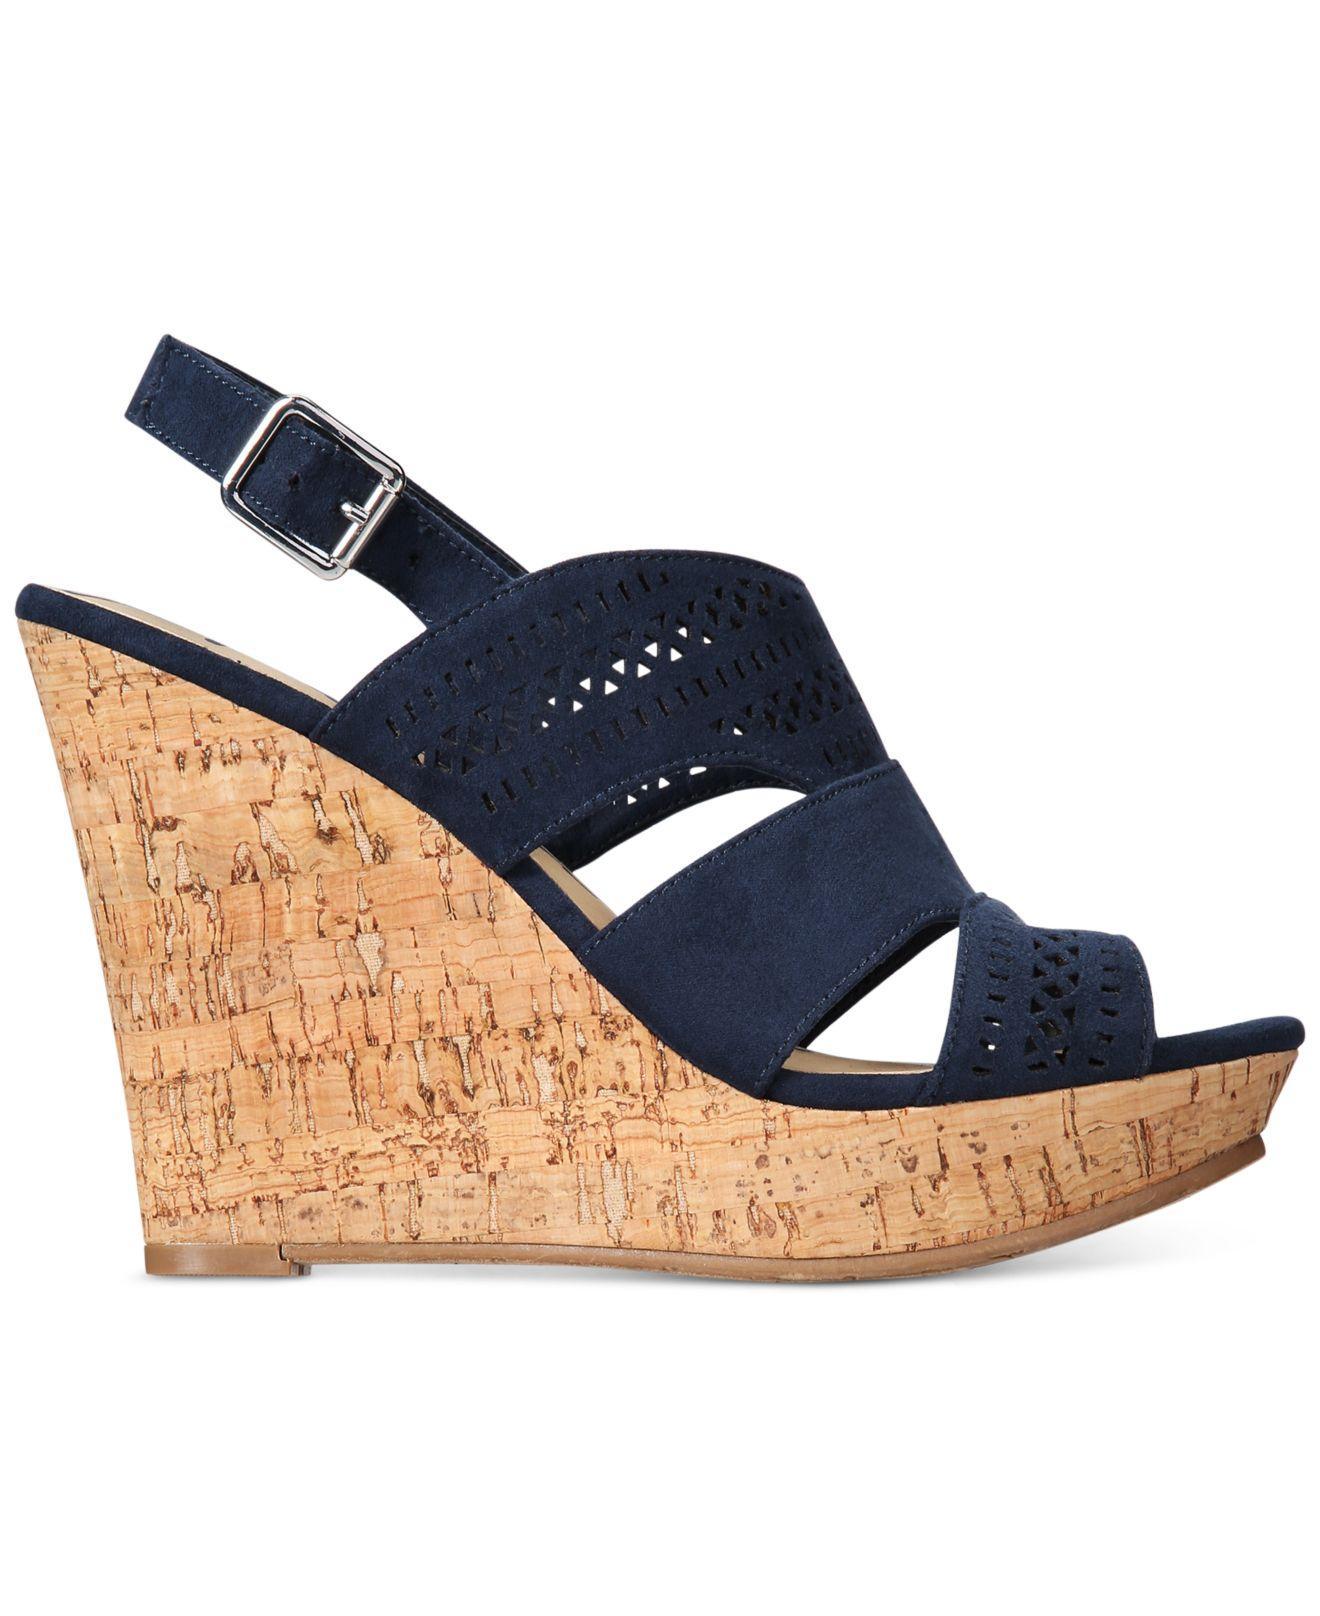 American Rag Womens Amirranda Peep Toe Casual Platform Sandals Navy Size 70